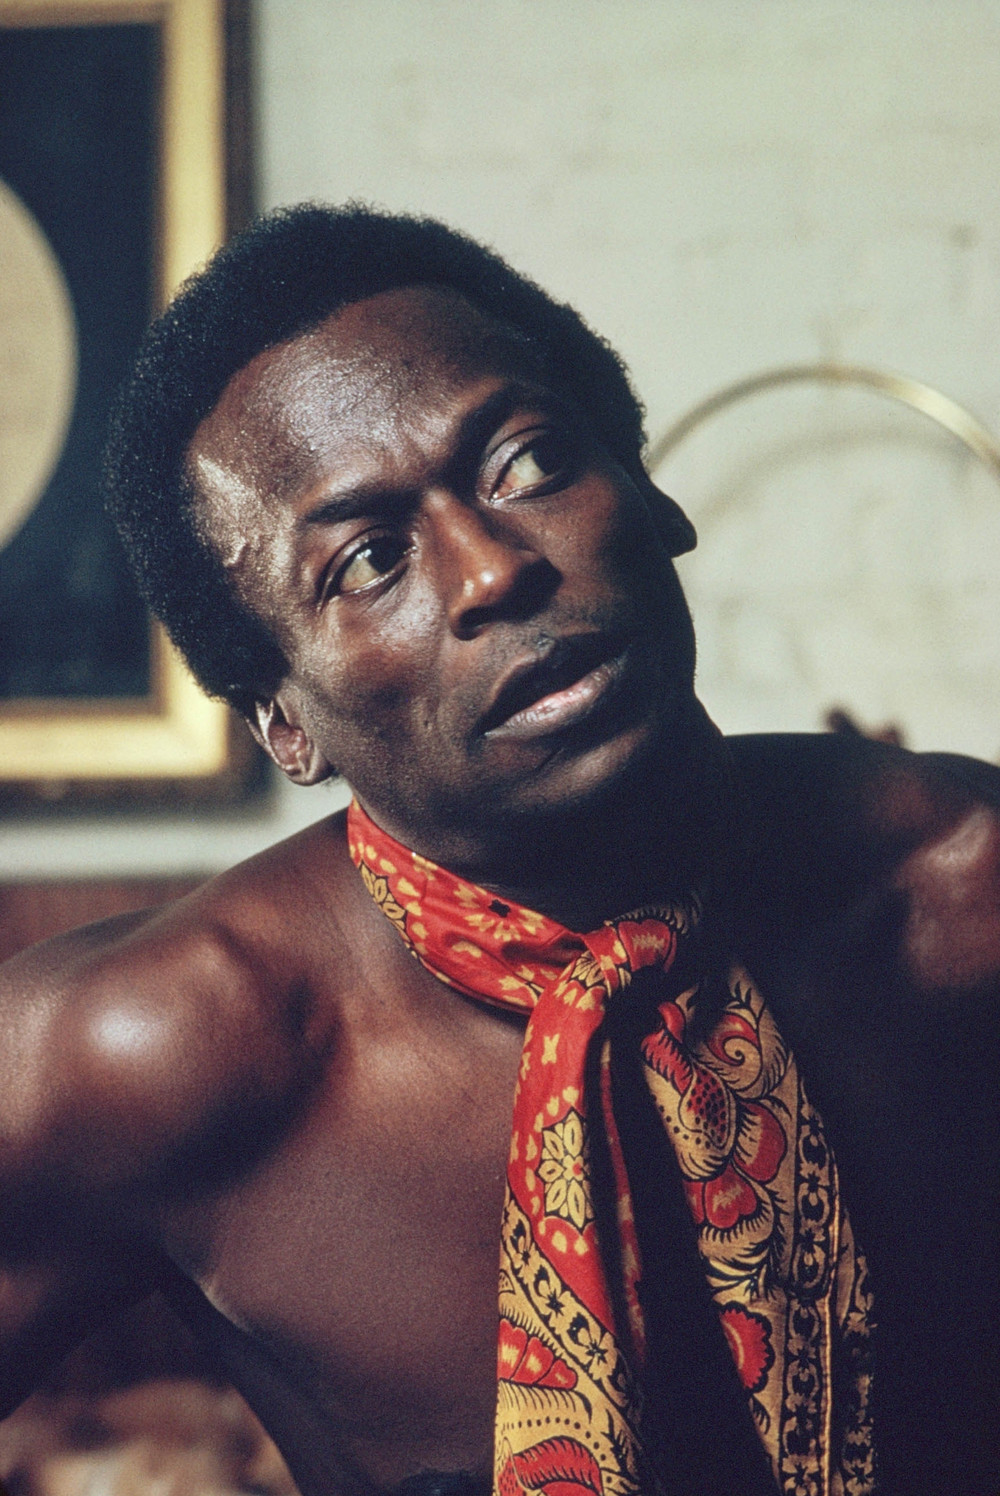 Miles Davis on Spotify